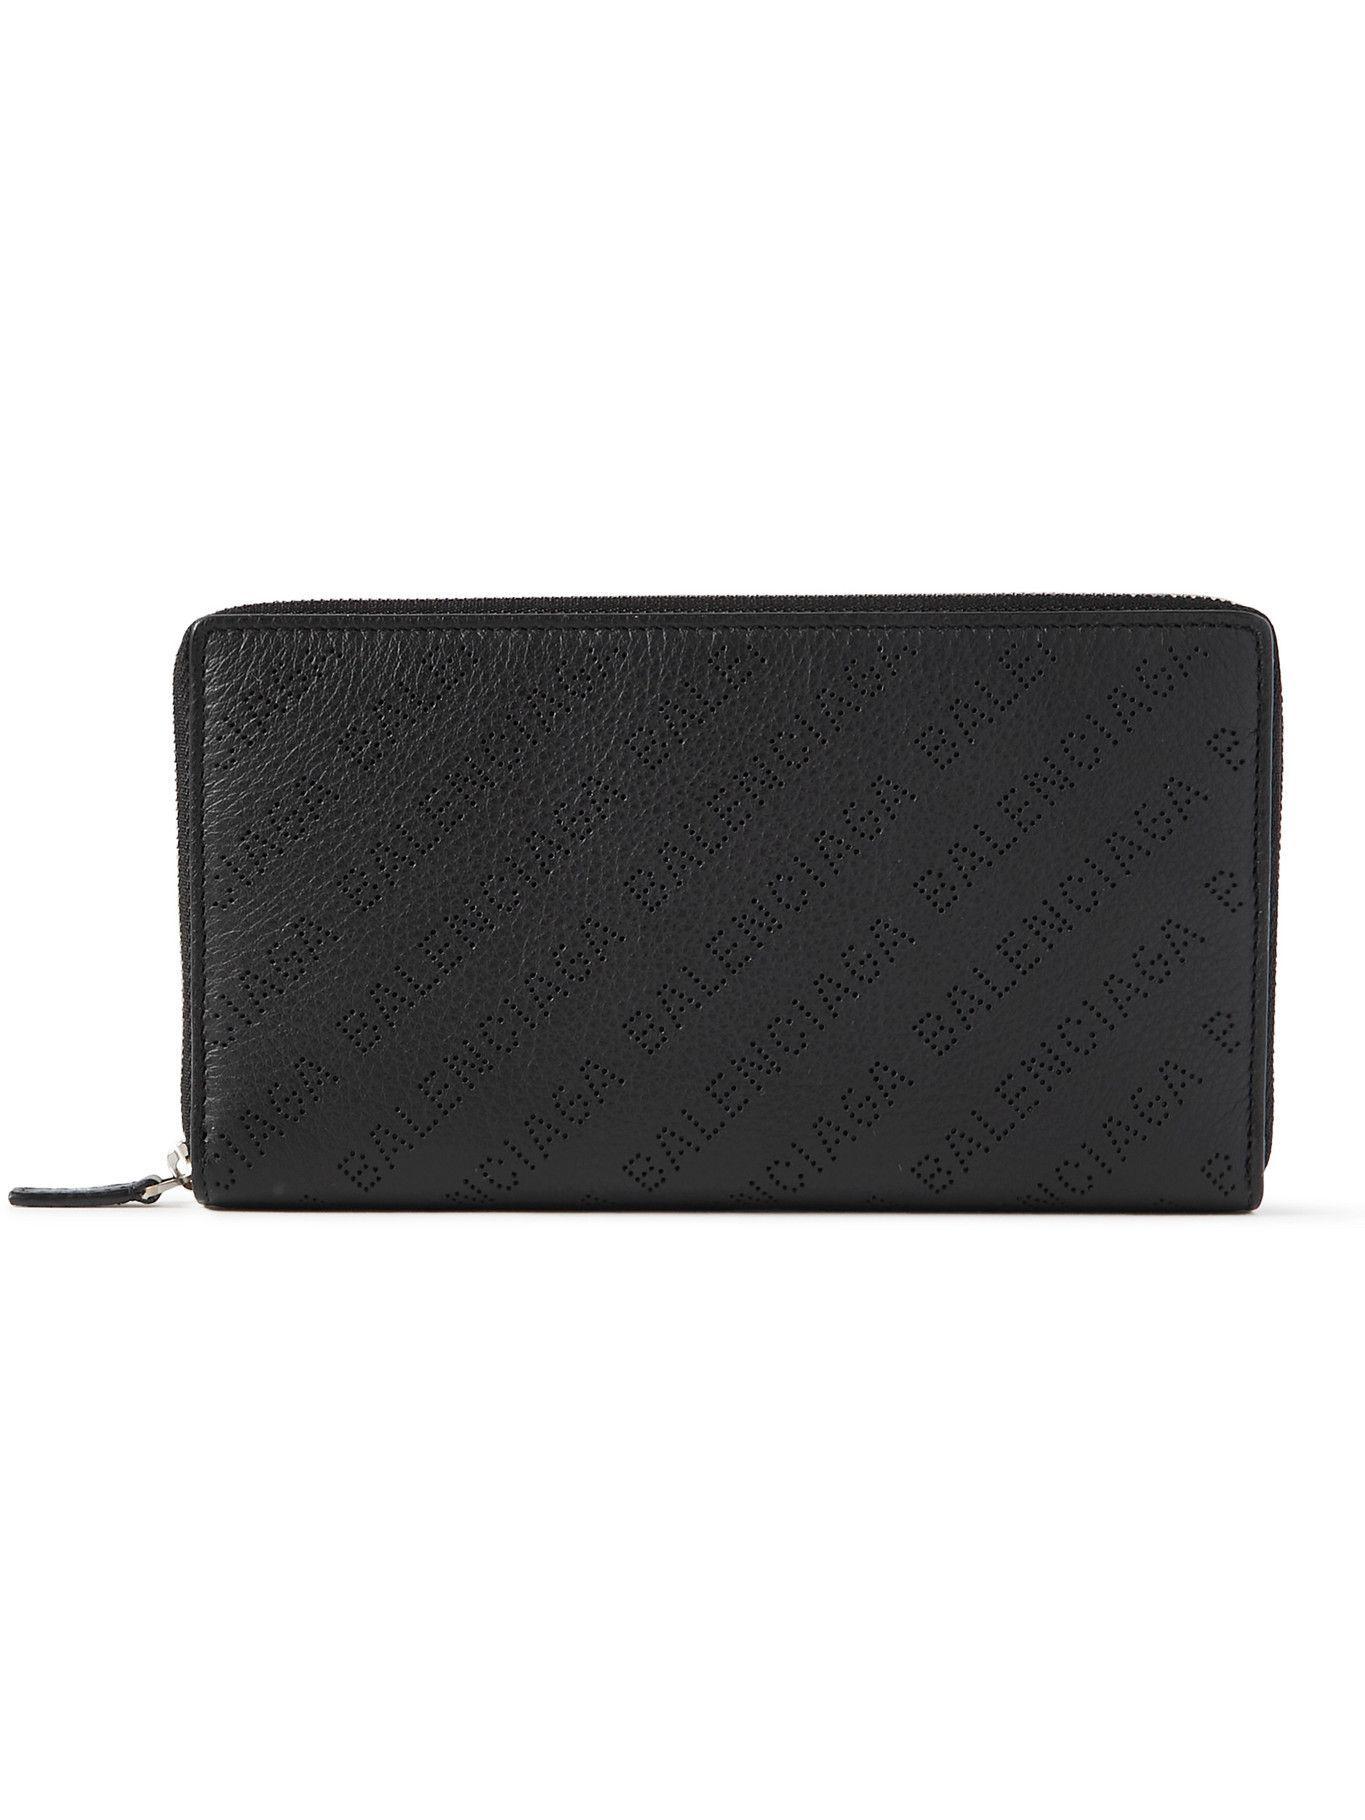 BALENCIAGA - Logo-Perforated Full-Grain Leather Zip-Around Wallet